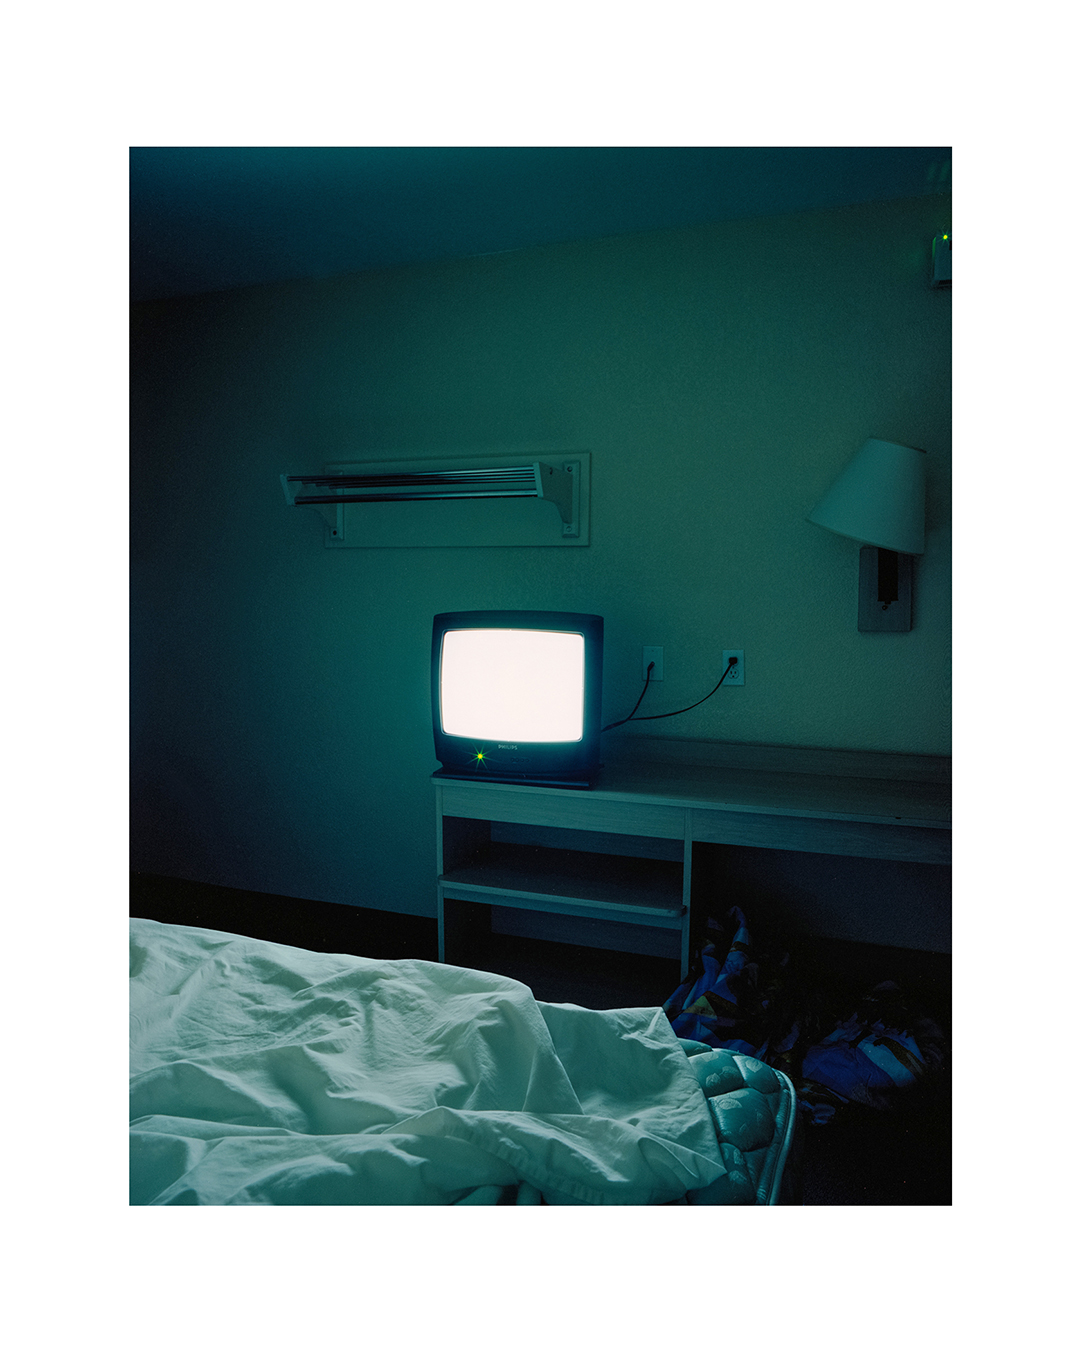 tv_010.jpg